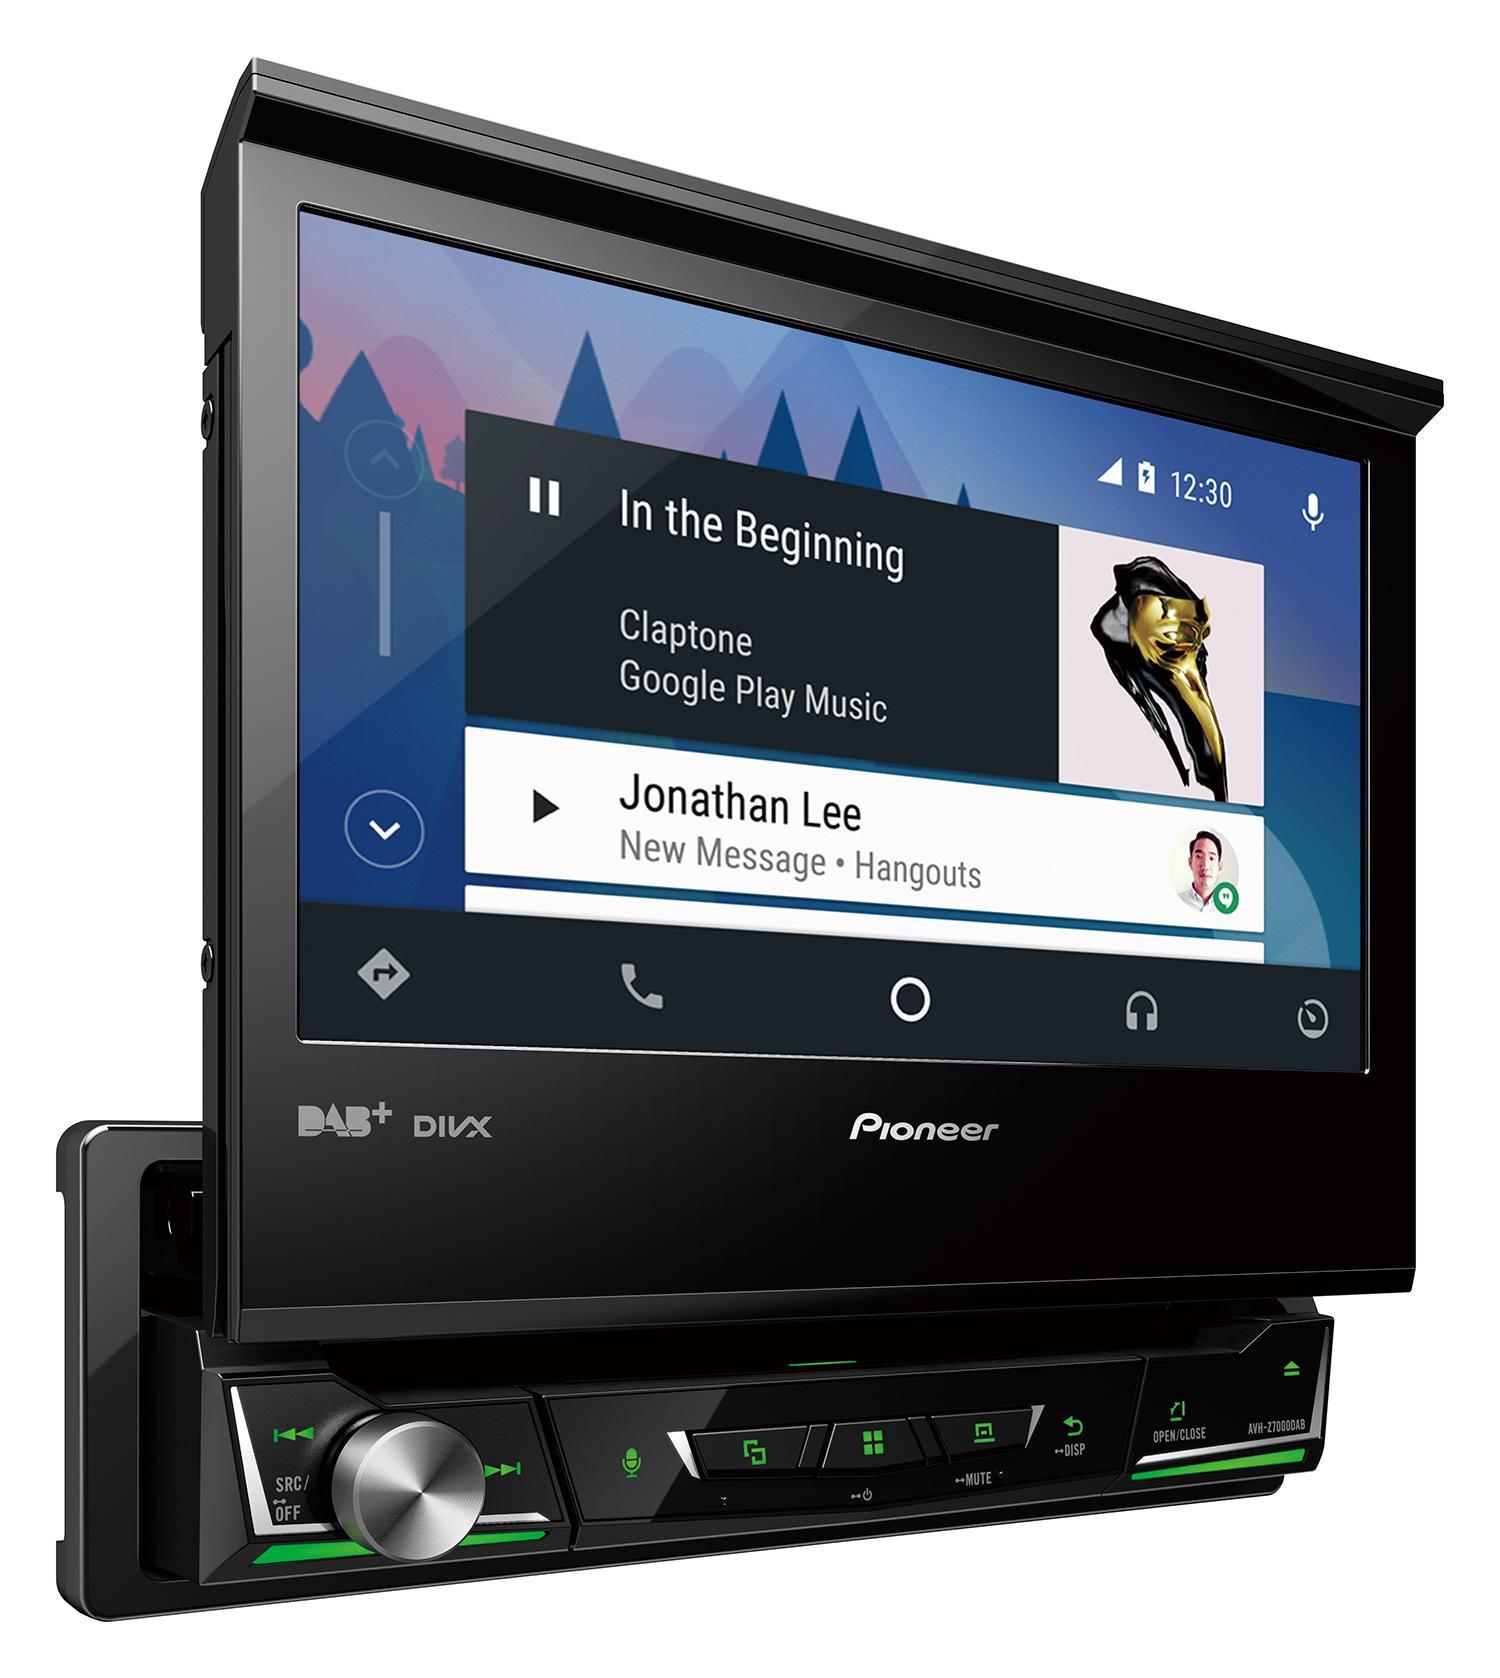 autoradio avh z7000dab dvd mp3 ipod iphone android usb bluetooth carplay waze ecran 7p. Black Bedroom Furniture Sets. Home Design Ideas